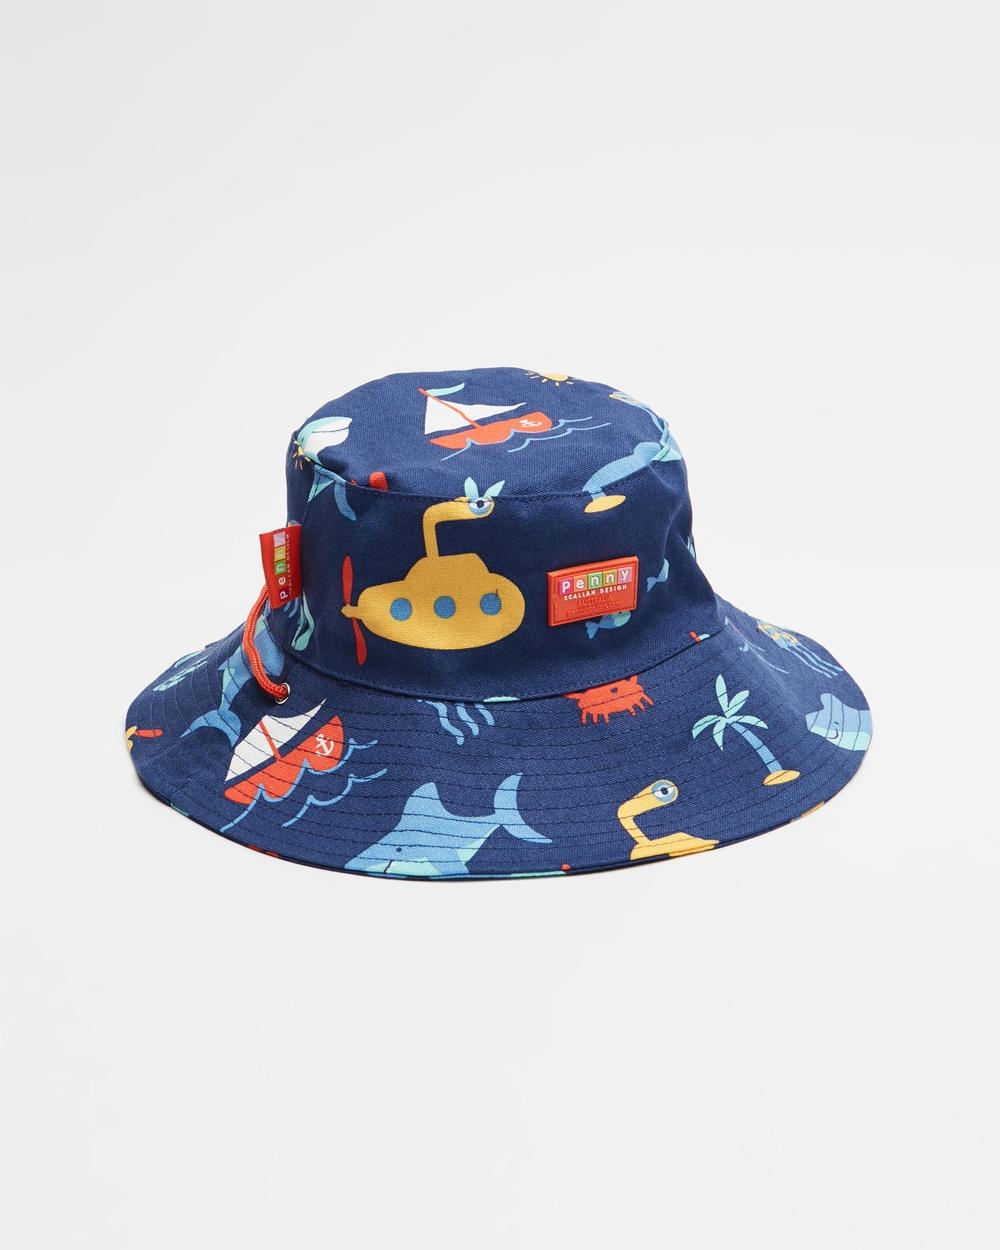 Penny Scallan Bucket Hat Hats Anchors Away